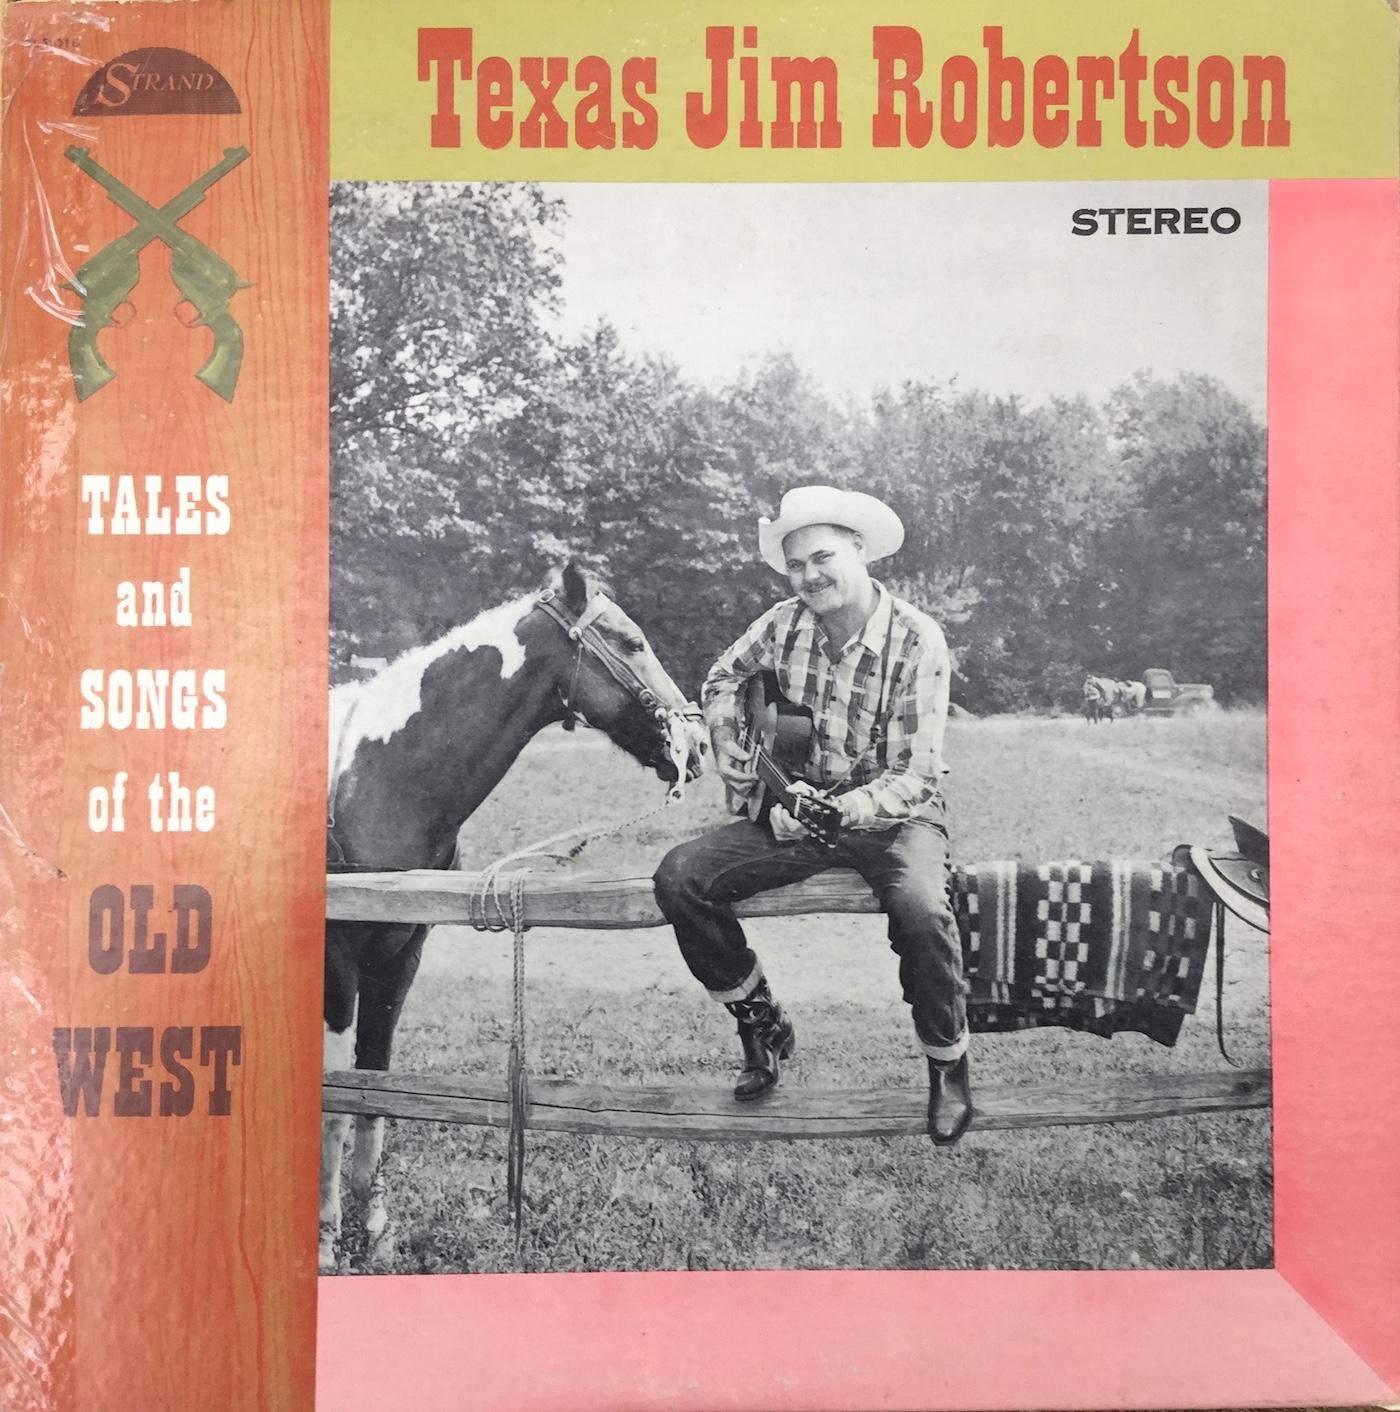 TexasJimRobertson_TalesOfOldWest